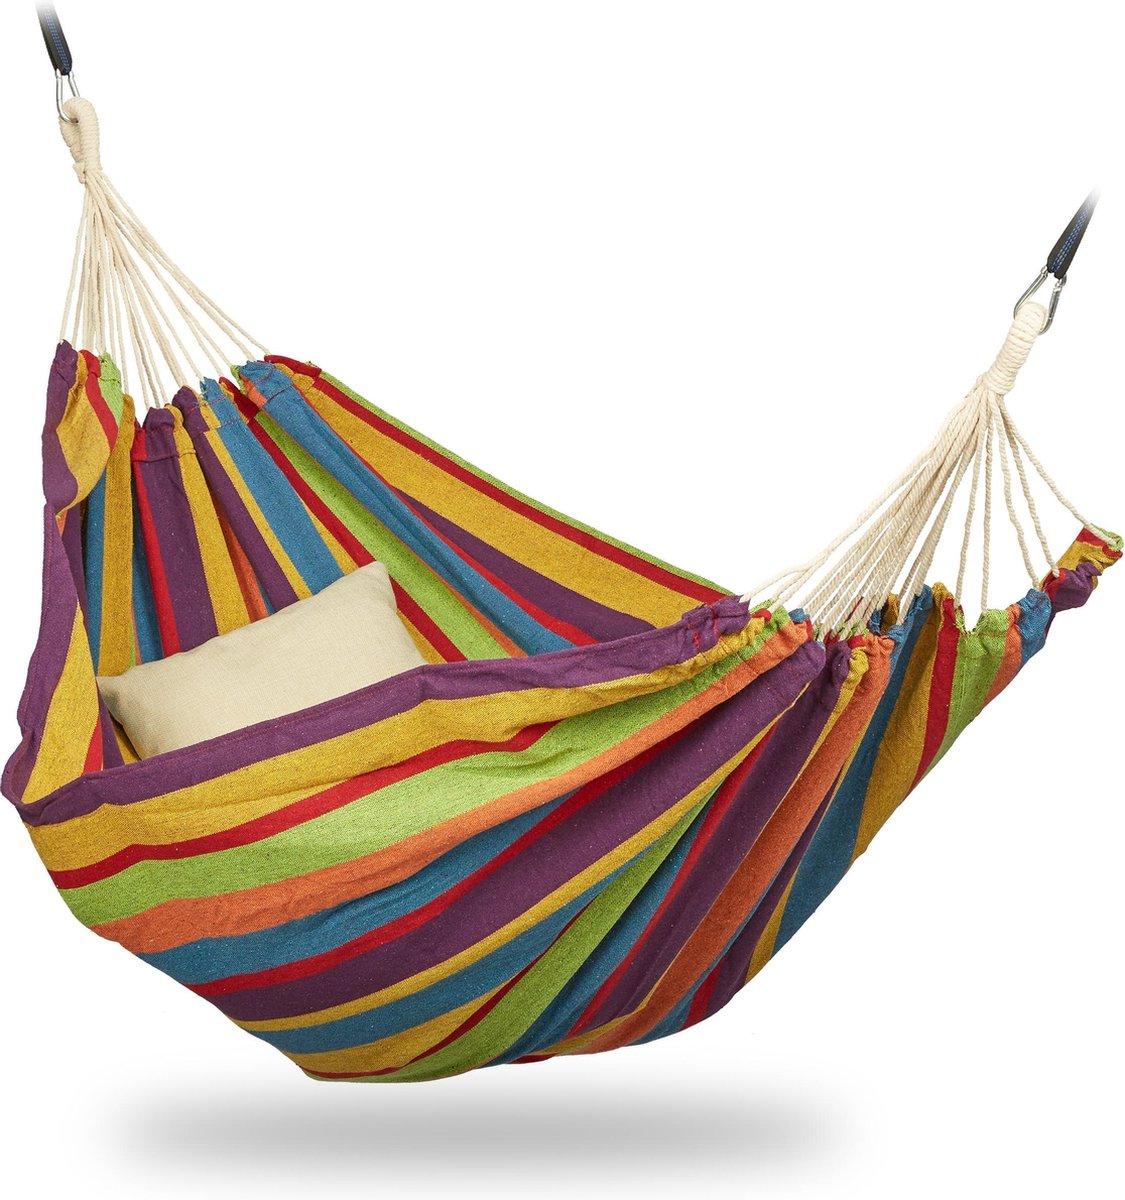 relaxdays 2 persoons hangmat - tot 300 kg - tweepersoons - buiten - katoen - opbergtas geel/groen/bl